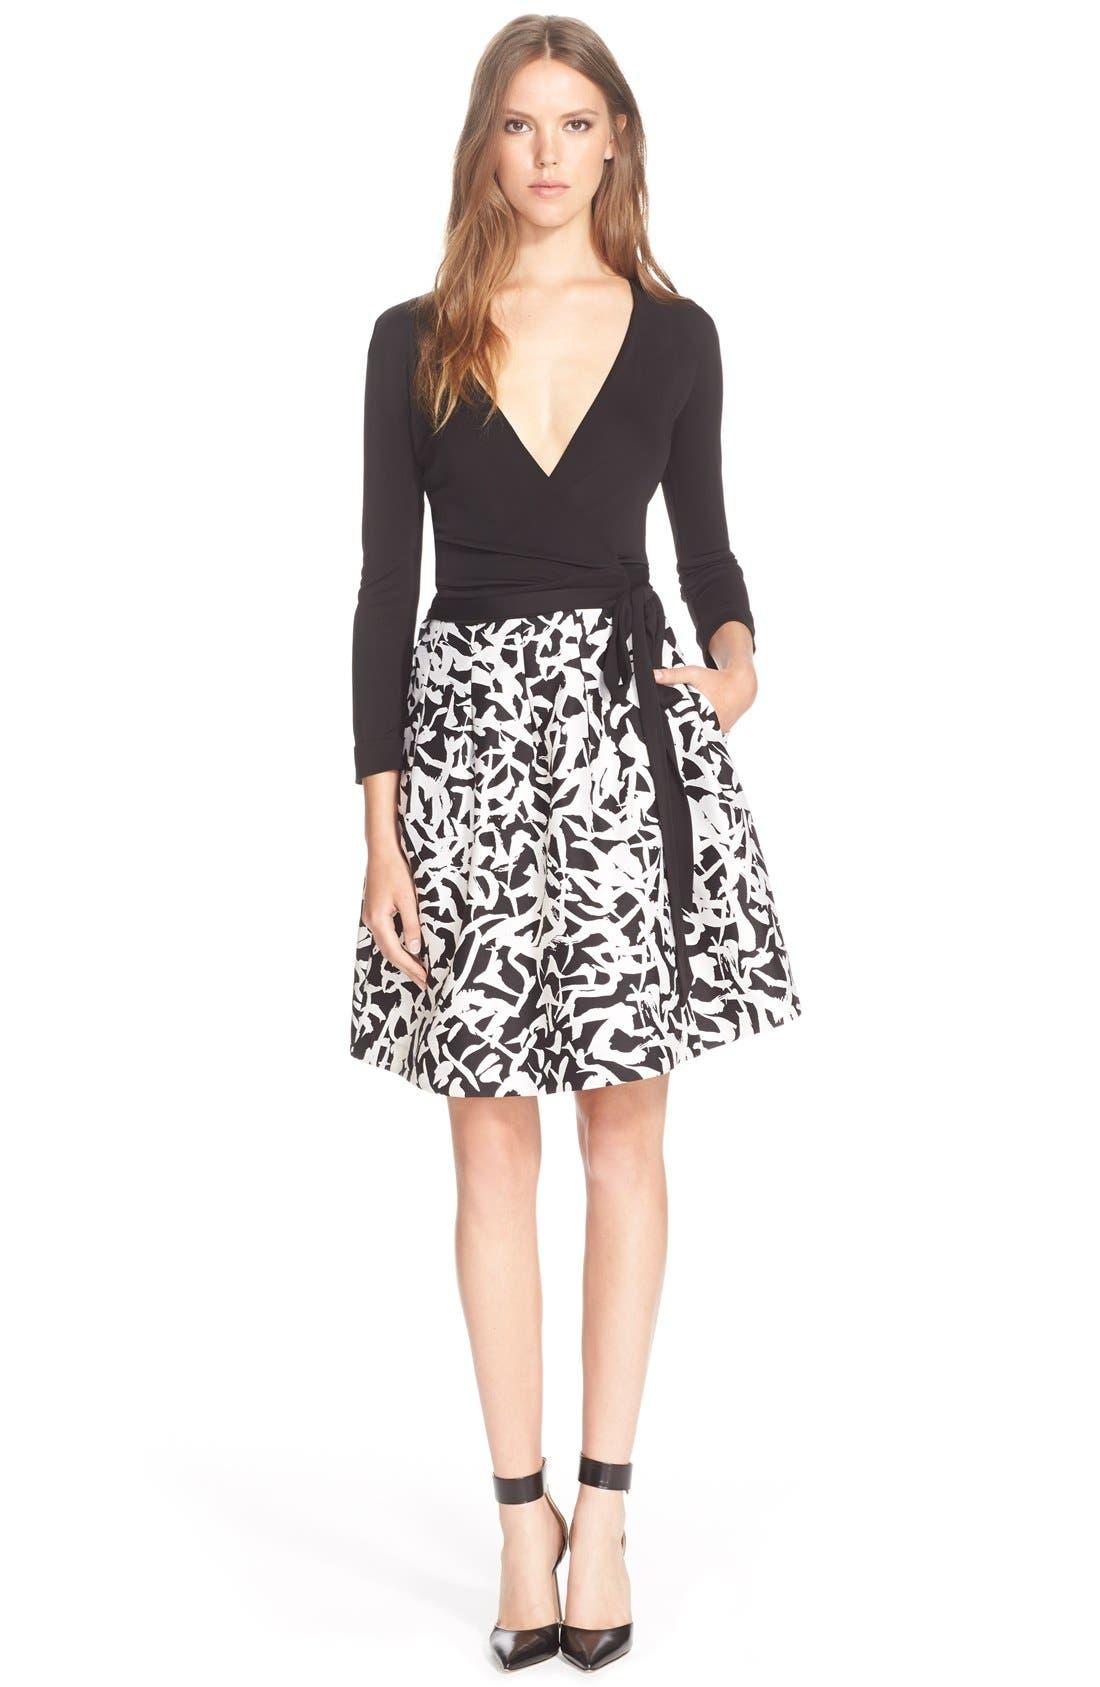 Main Image - Diane vonFurstenberg'Jewel' Wrap Dress